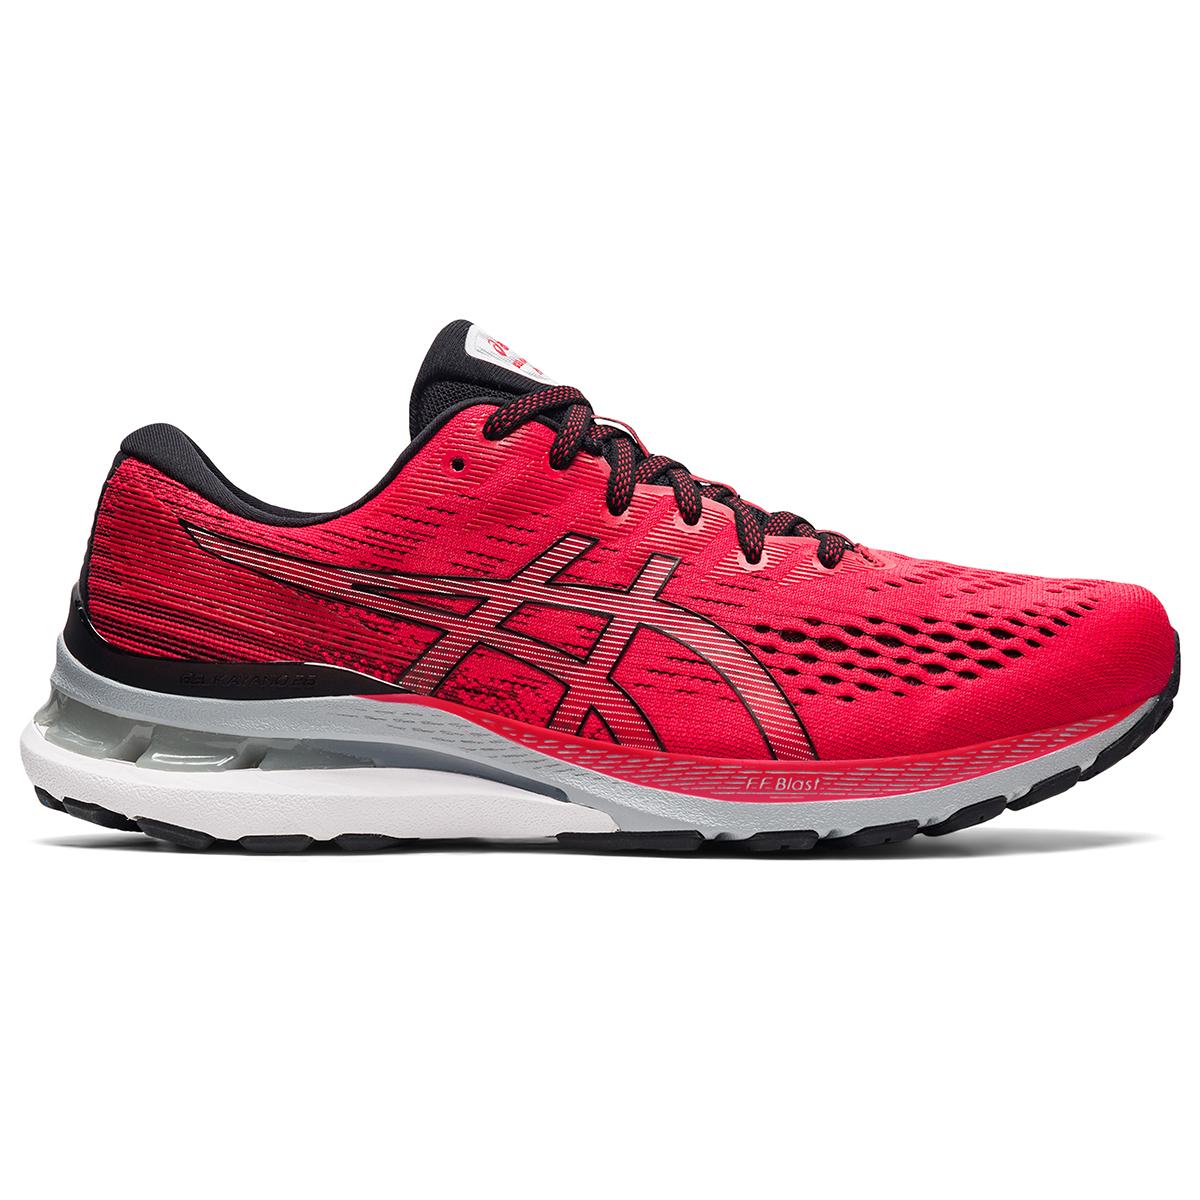 Men's Asics Gel-Kayano 28 Running Shoe - Color: Electric Red - Size: 7 - Width: Regular, Electric Red, large, image 1